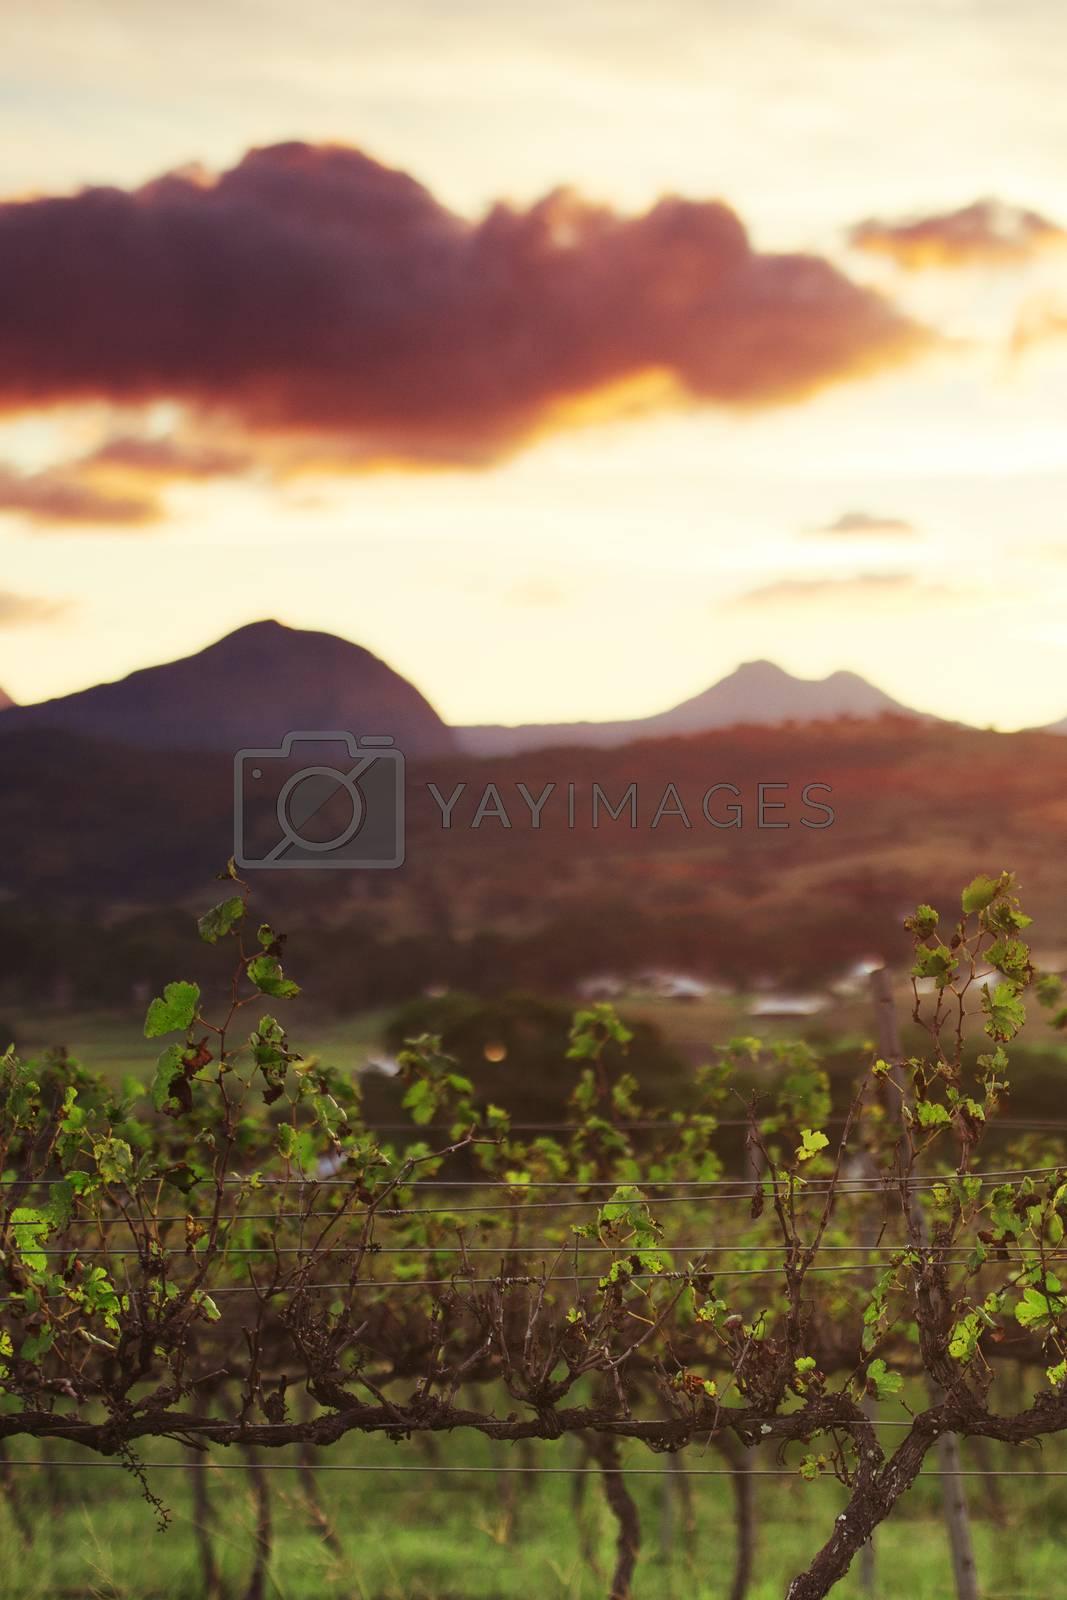 Lavender farm and vineyard in Kooroomba, Queensland in the afternoon.